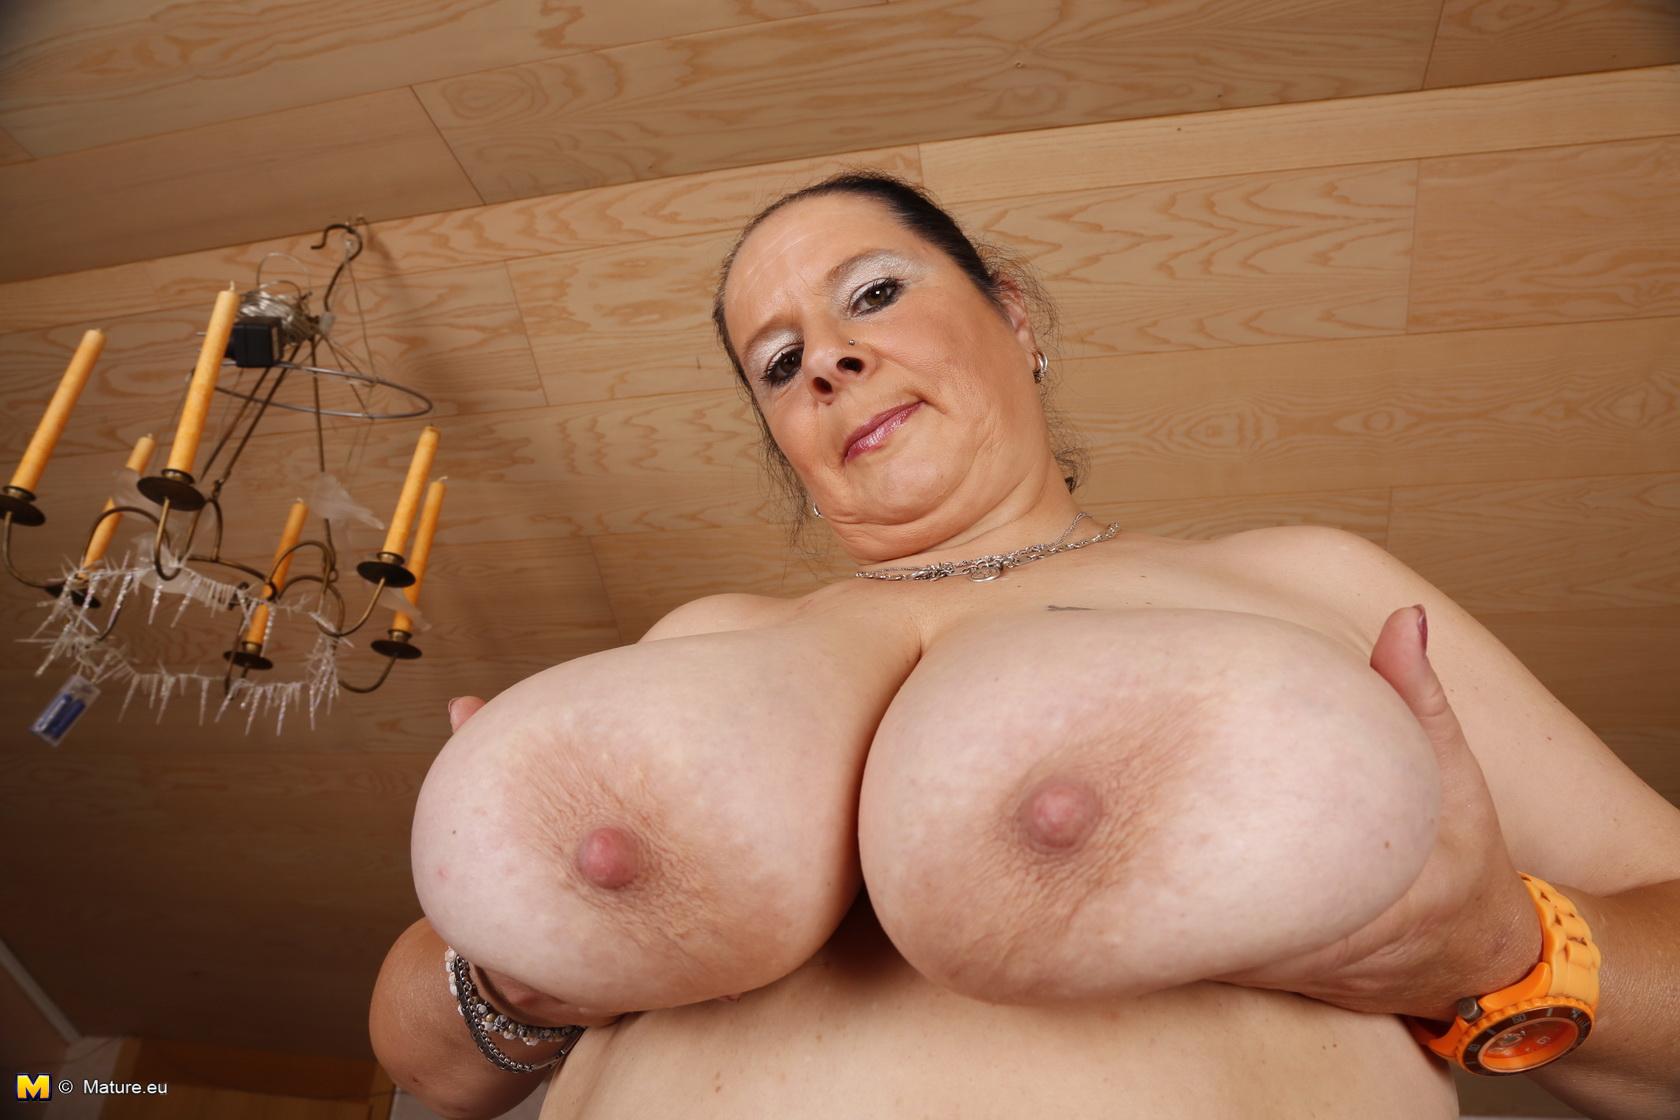 Porn stars sex pics